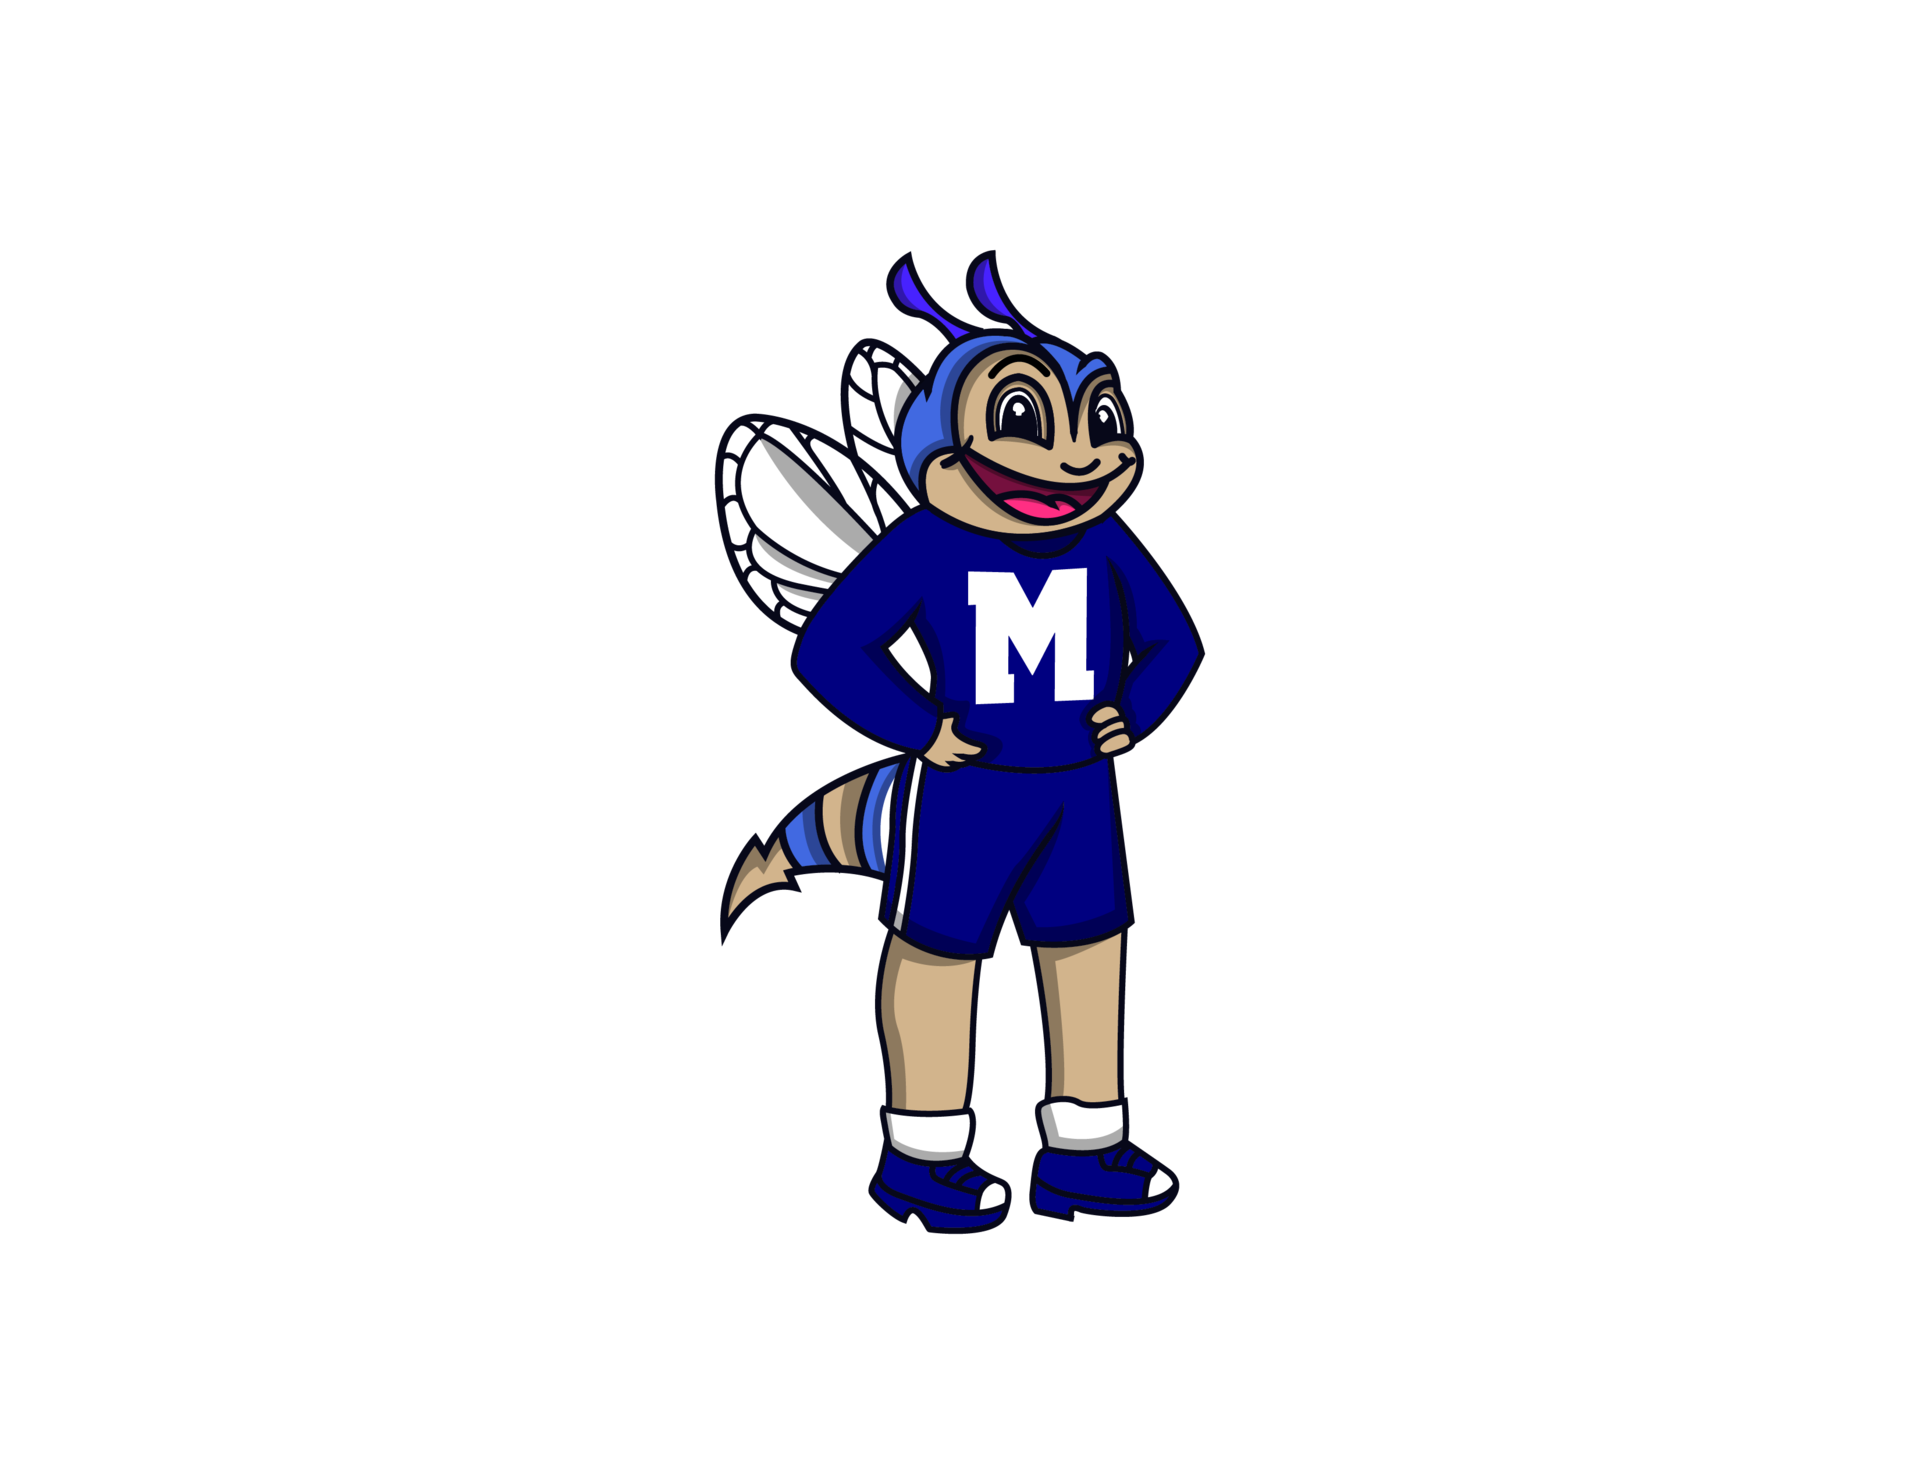 Howie the Hornet Mascot